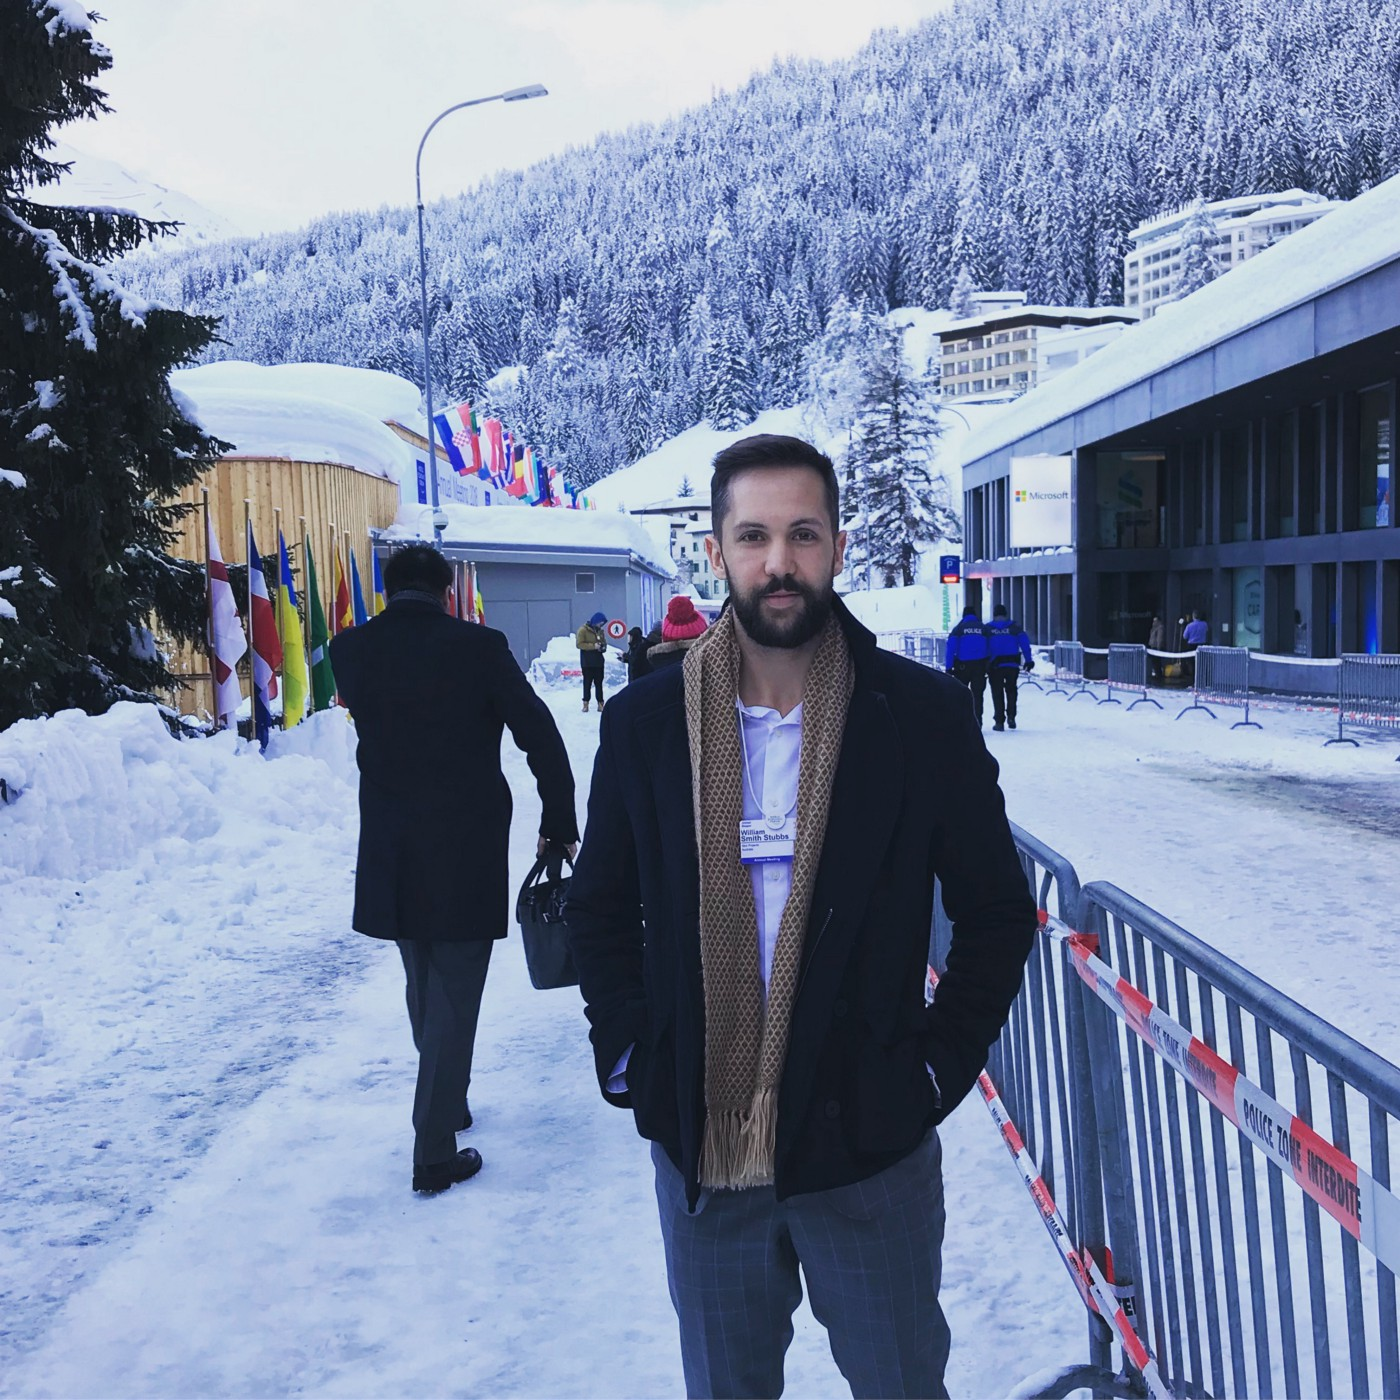 Submachine guns, social impact, and selfies: A trip to Davos.